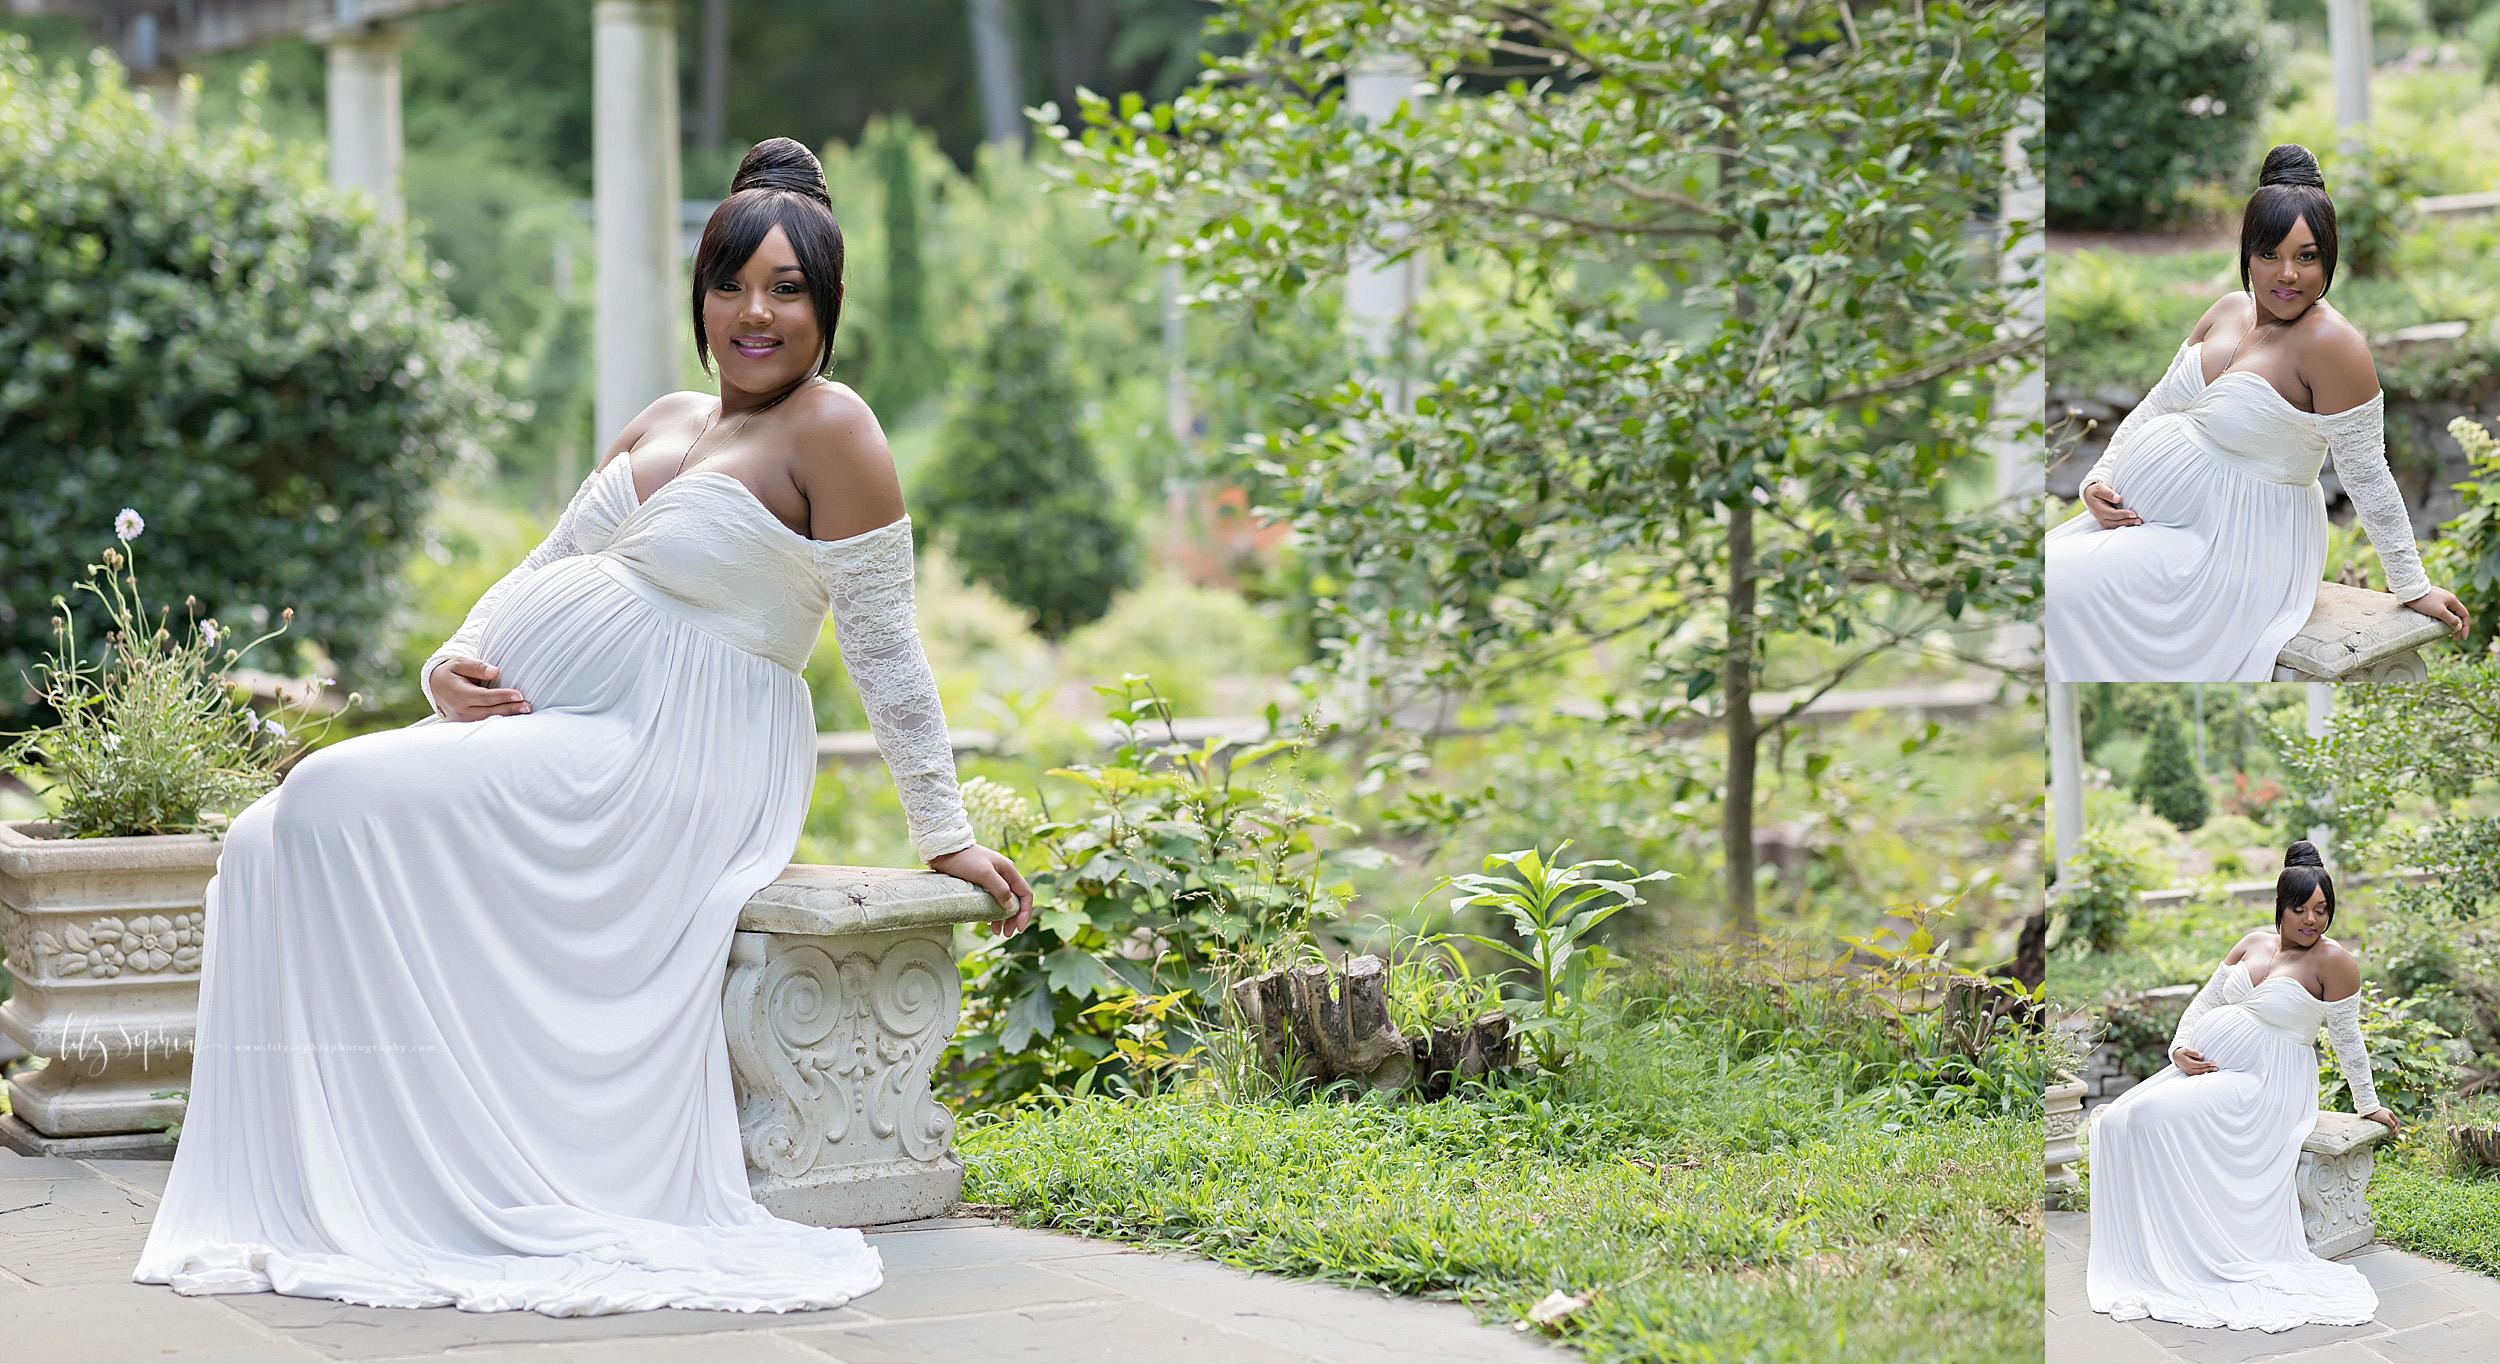 atlanta-buckhead-acworth-brookhaven-lily-sophia-photography-baby-maternity-photographer-maternity-portraits-outdoor-gardens-sunset-grant-park-intown-pregnant-expecting-baby-boy_0219.jpg